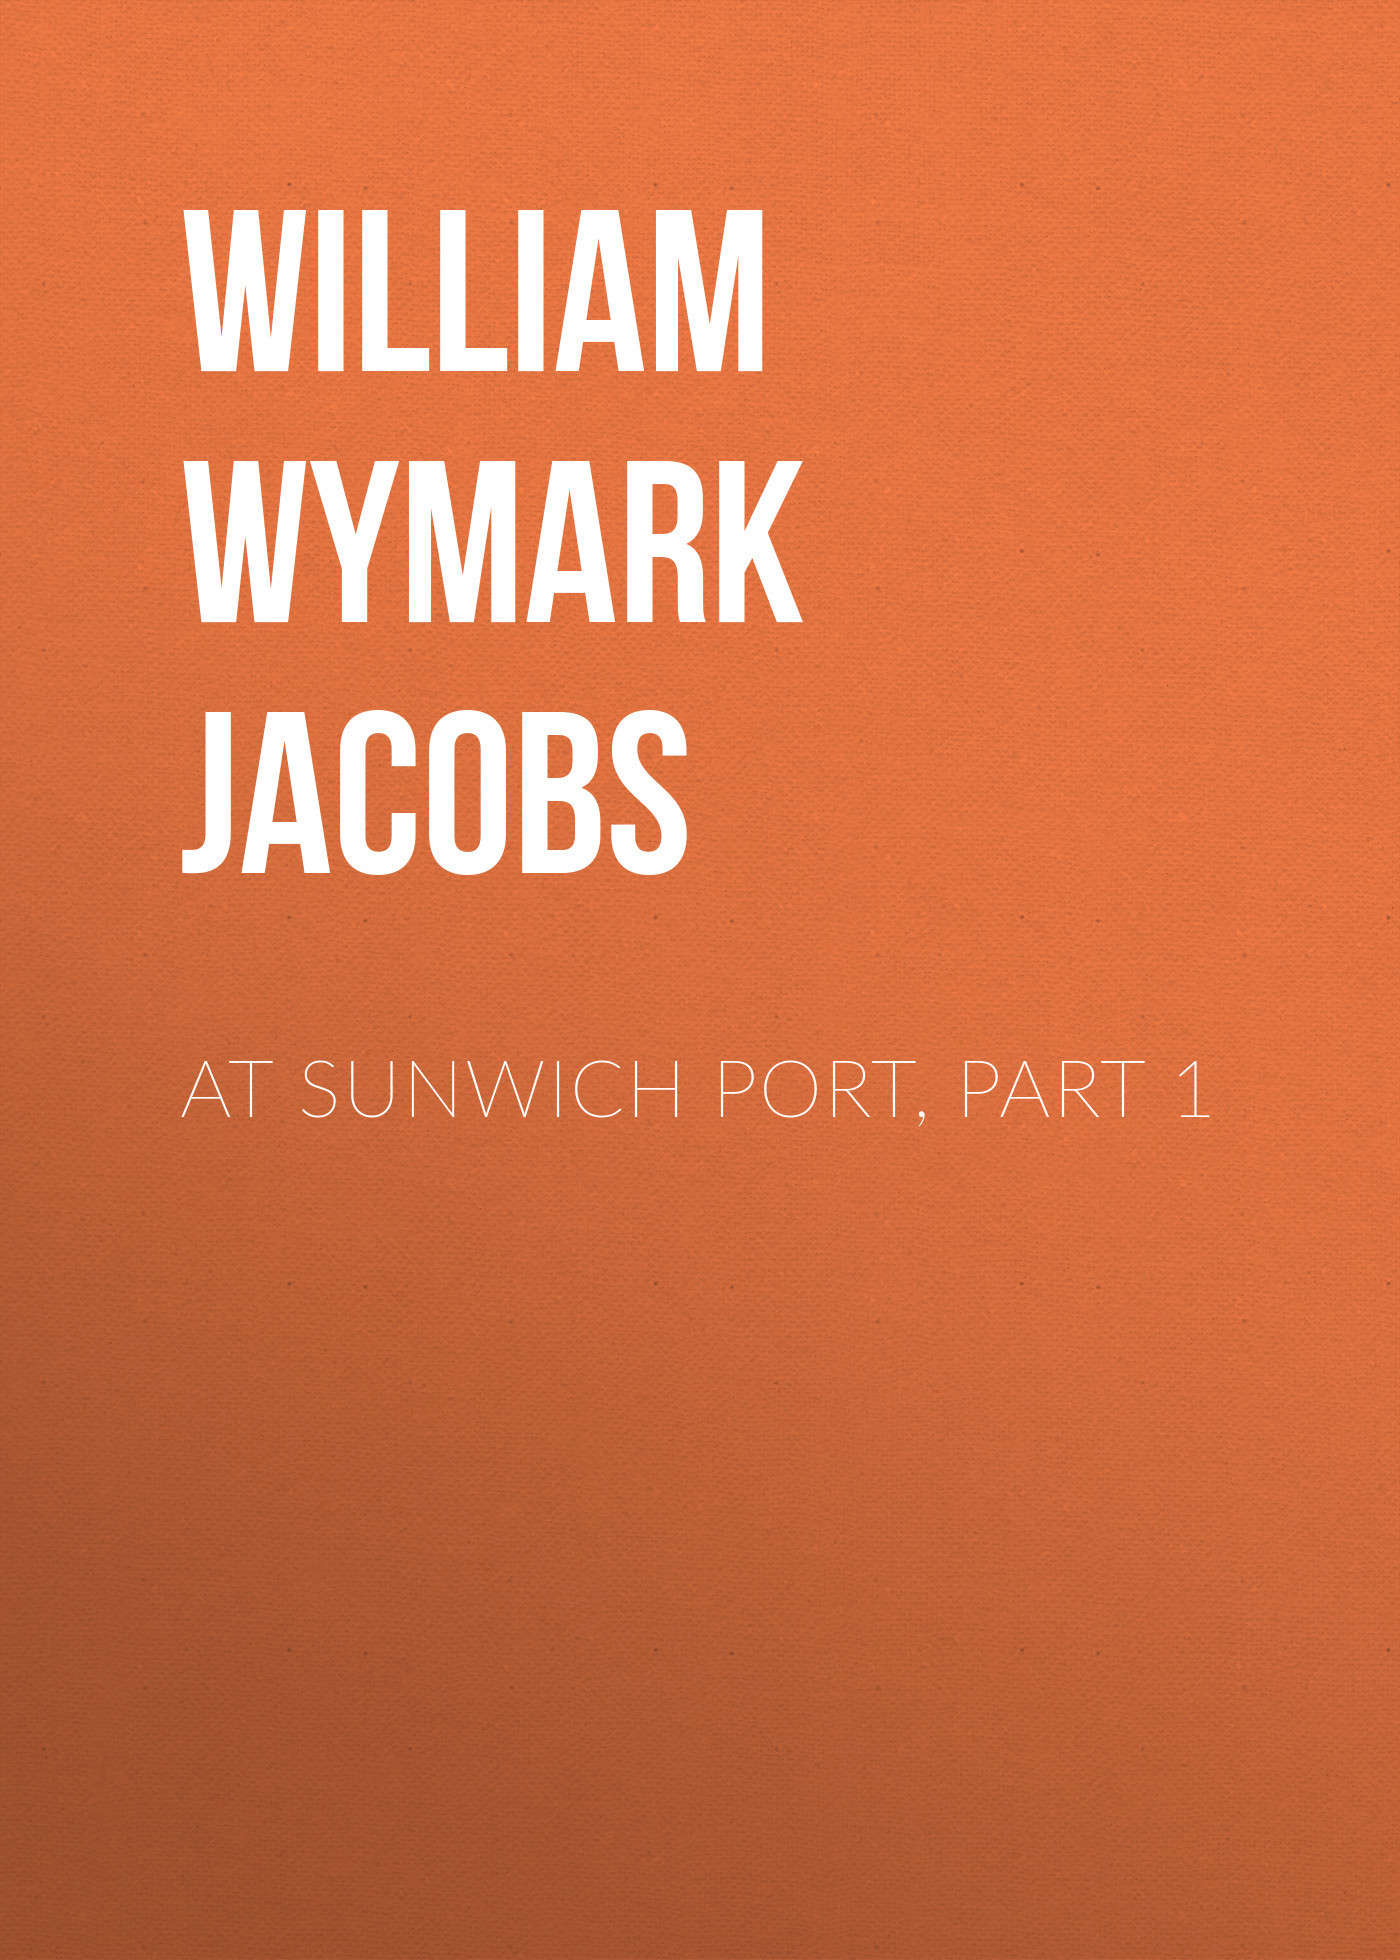 At Sunwich Port, Part 1